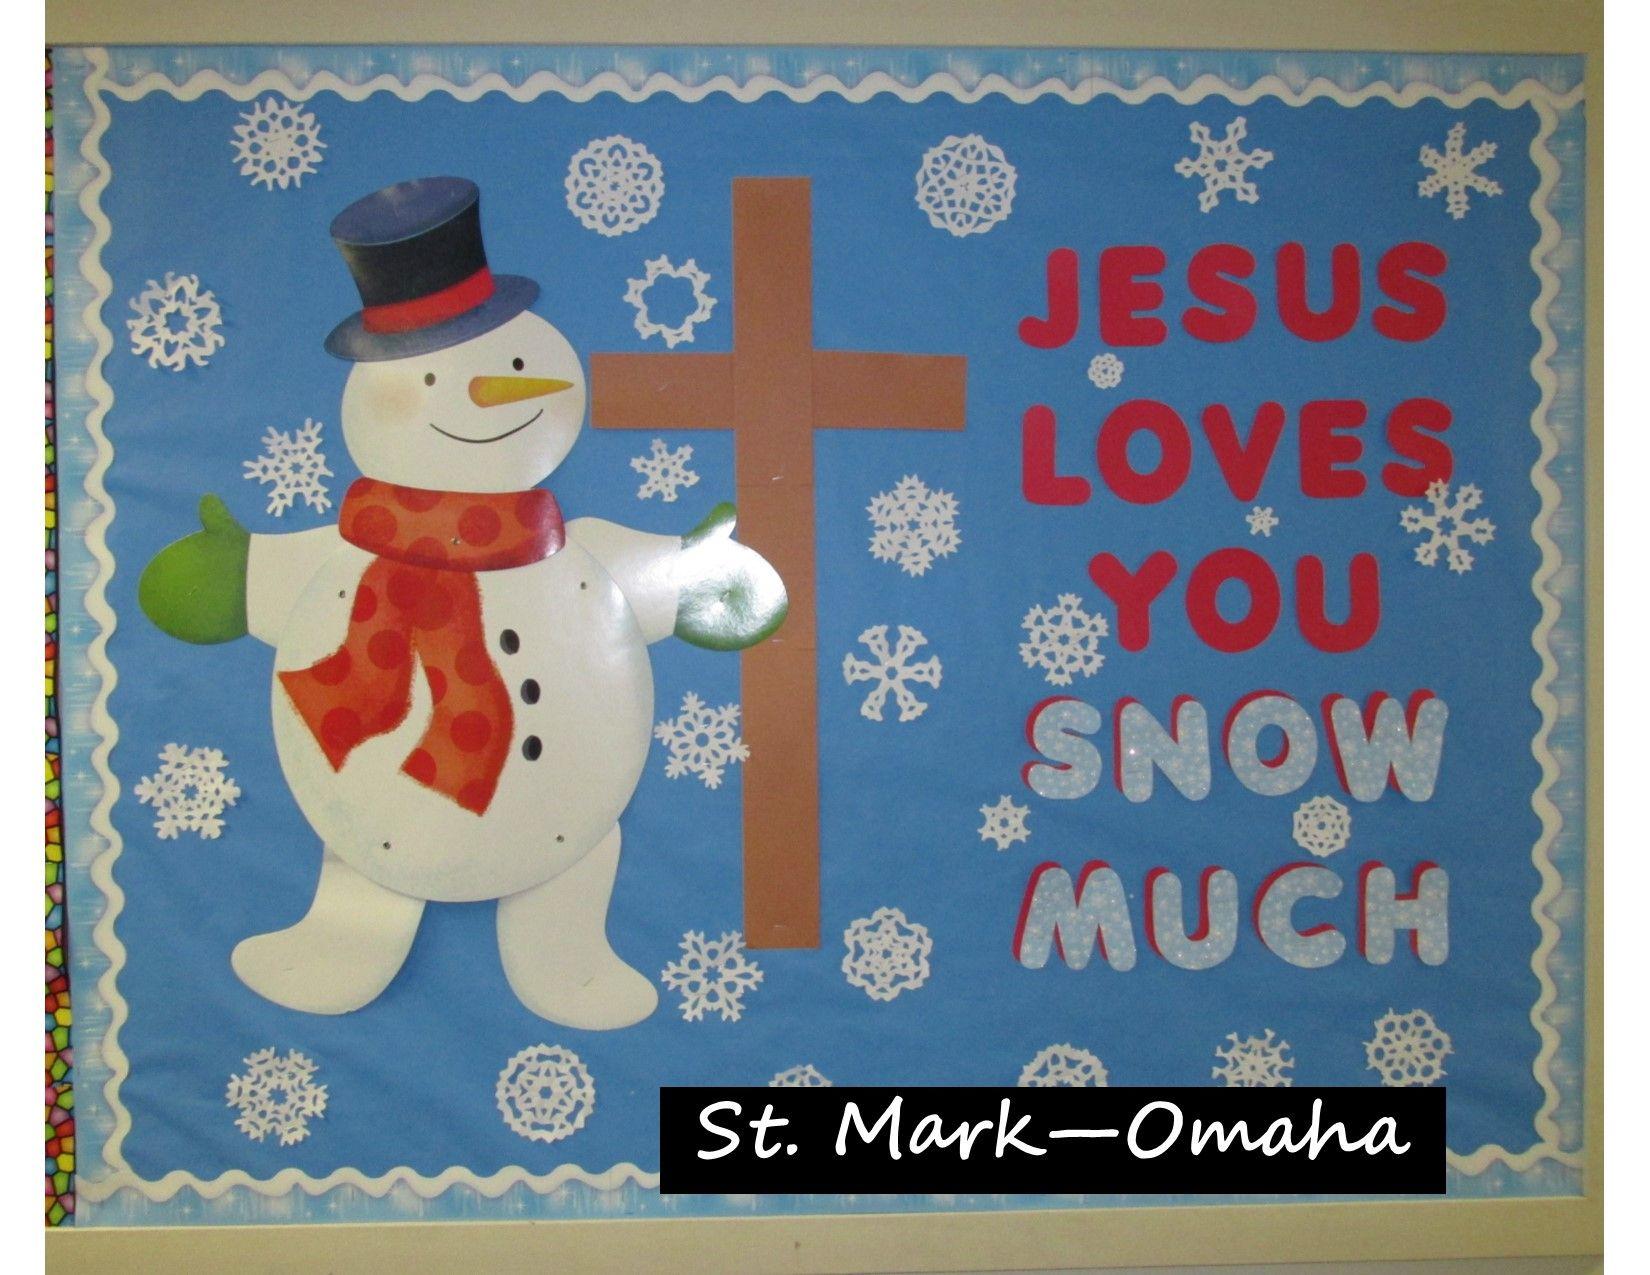 Sunday School Bulletin Board A Good Design For January Decorations Preschool Boards Winter